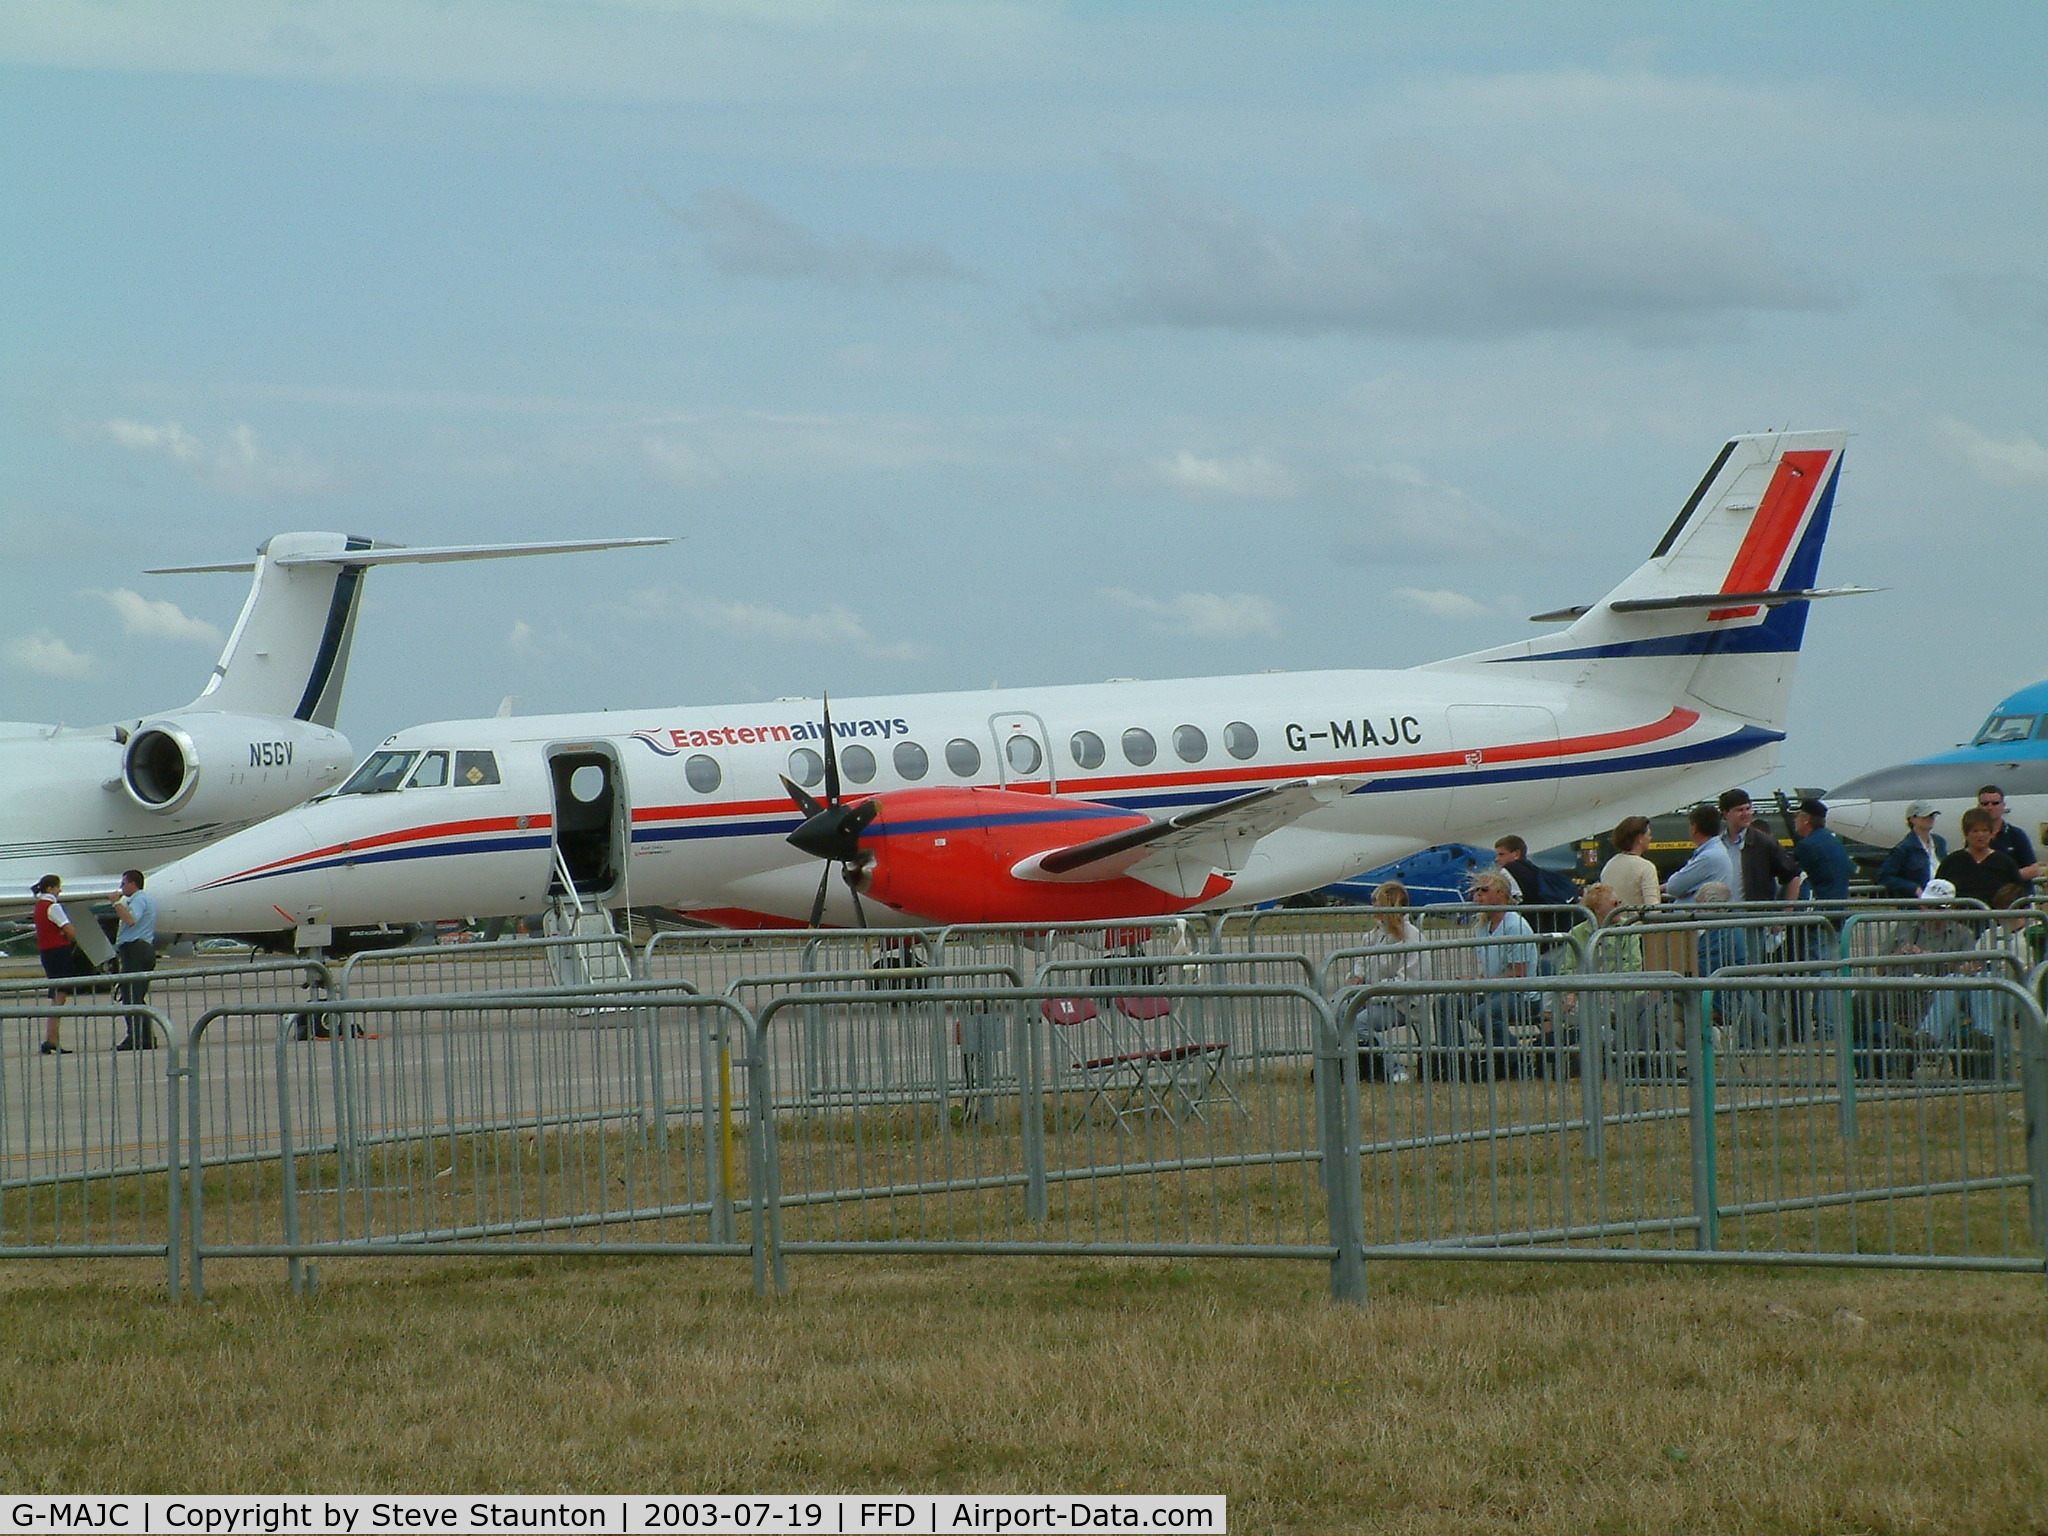 G-MAJC, 1992 British Aerospace Jetstream 41 C/N 41005, Royal International Air Tattoo 2003